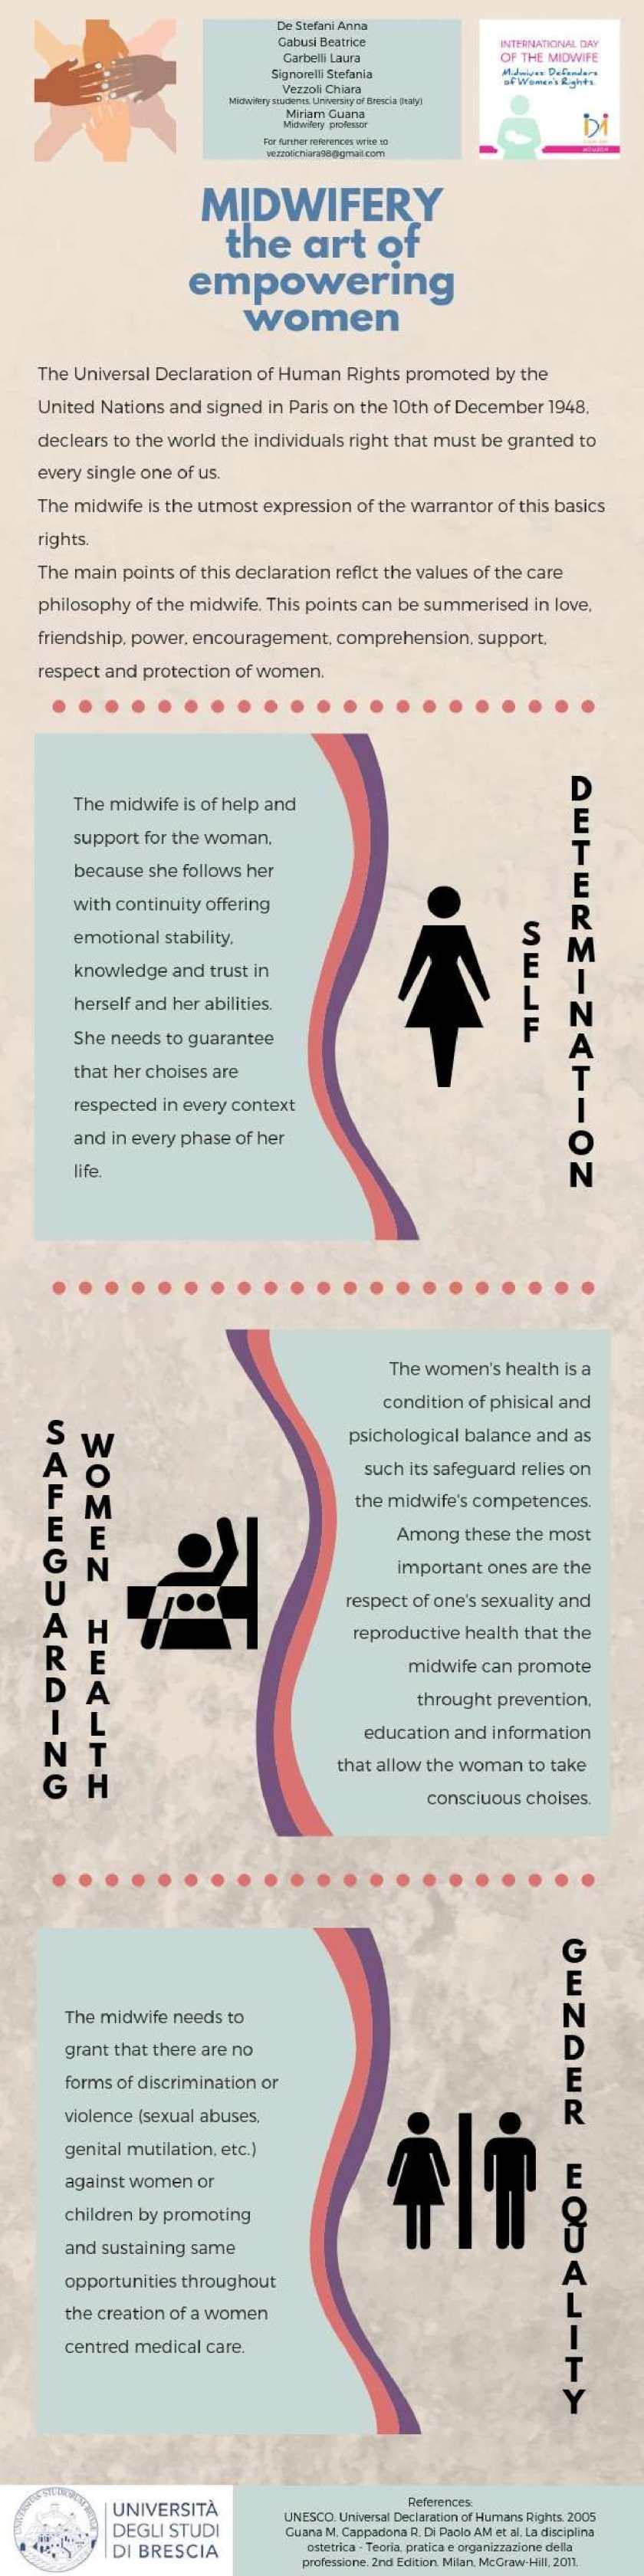 Midwifery: the art of empowering women